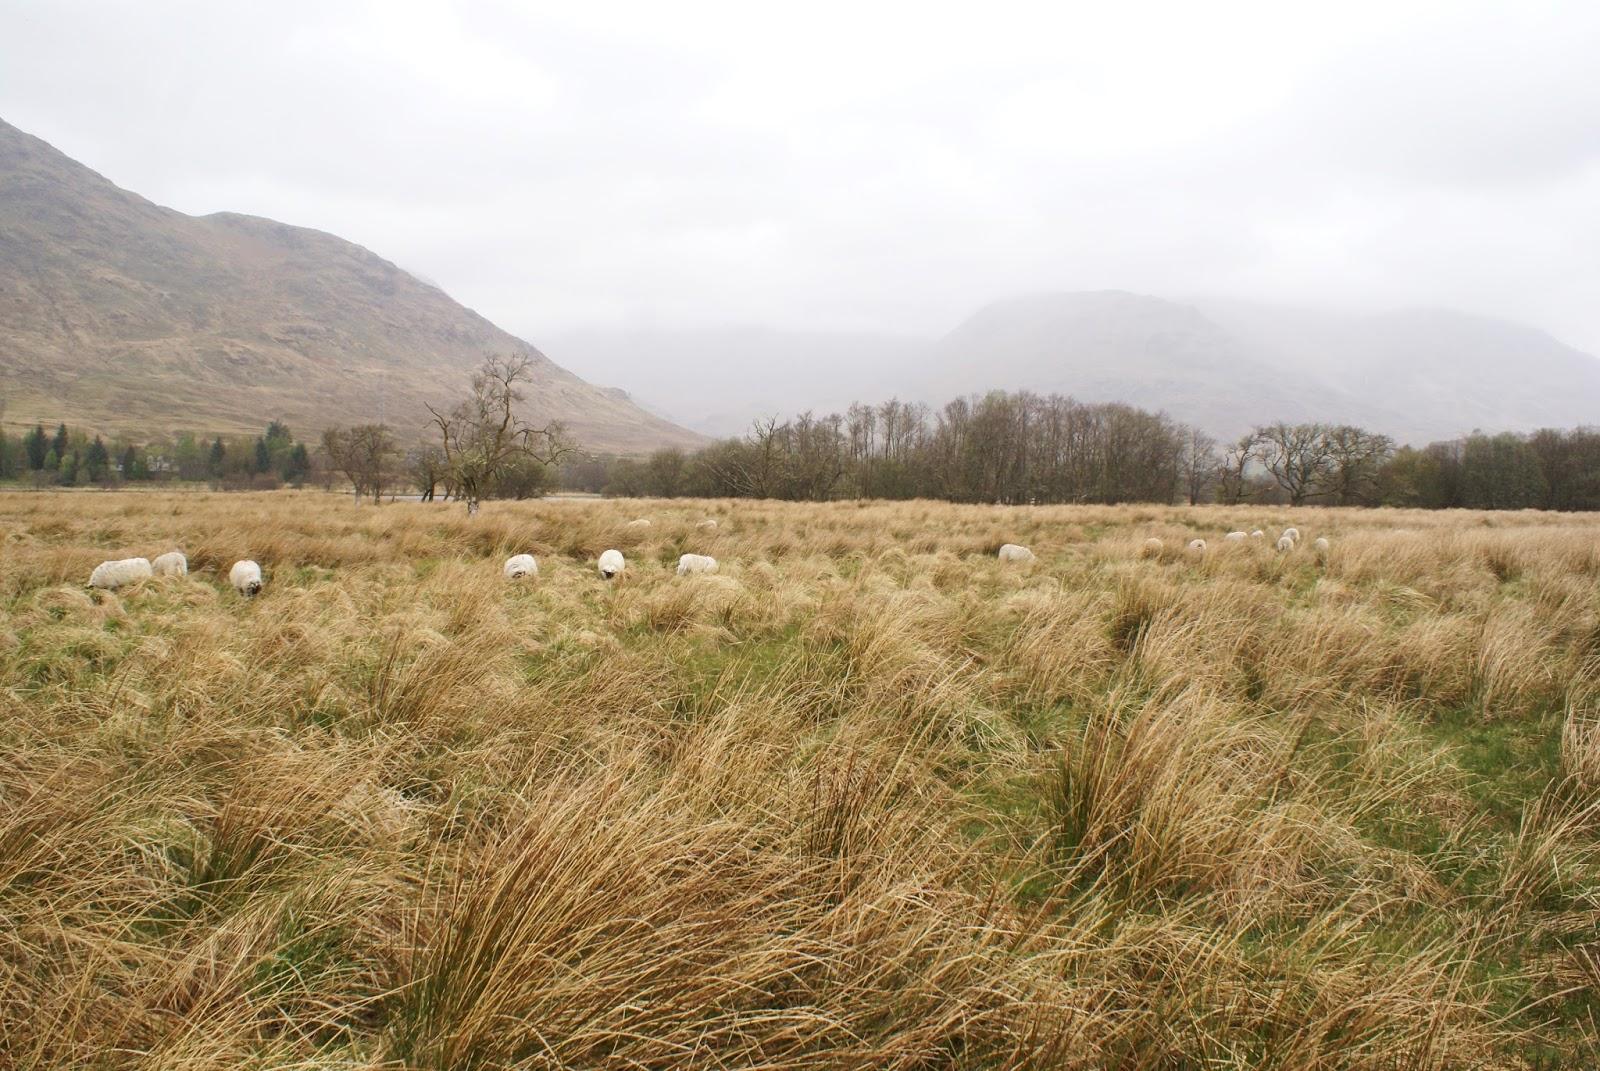 sheep kilchurn castle loch awe highlands scotland uk great britain camomille blend